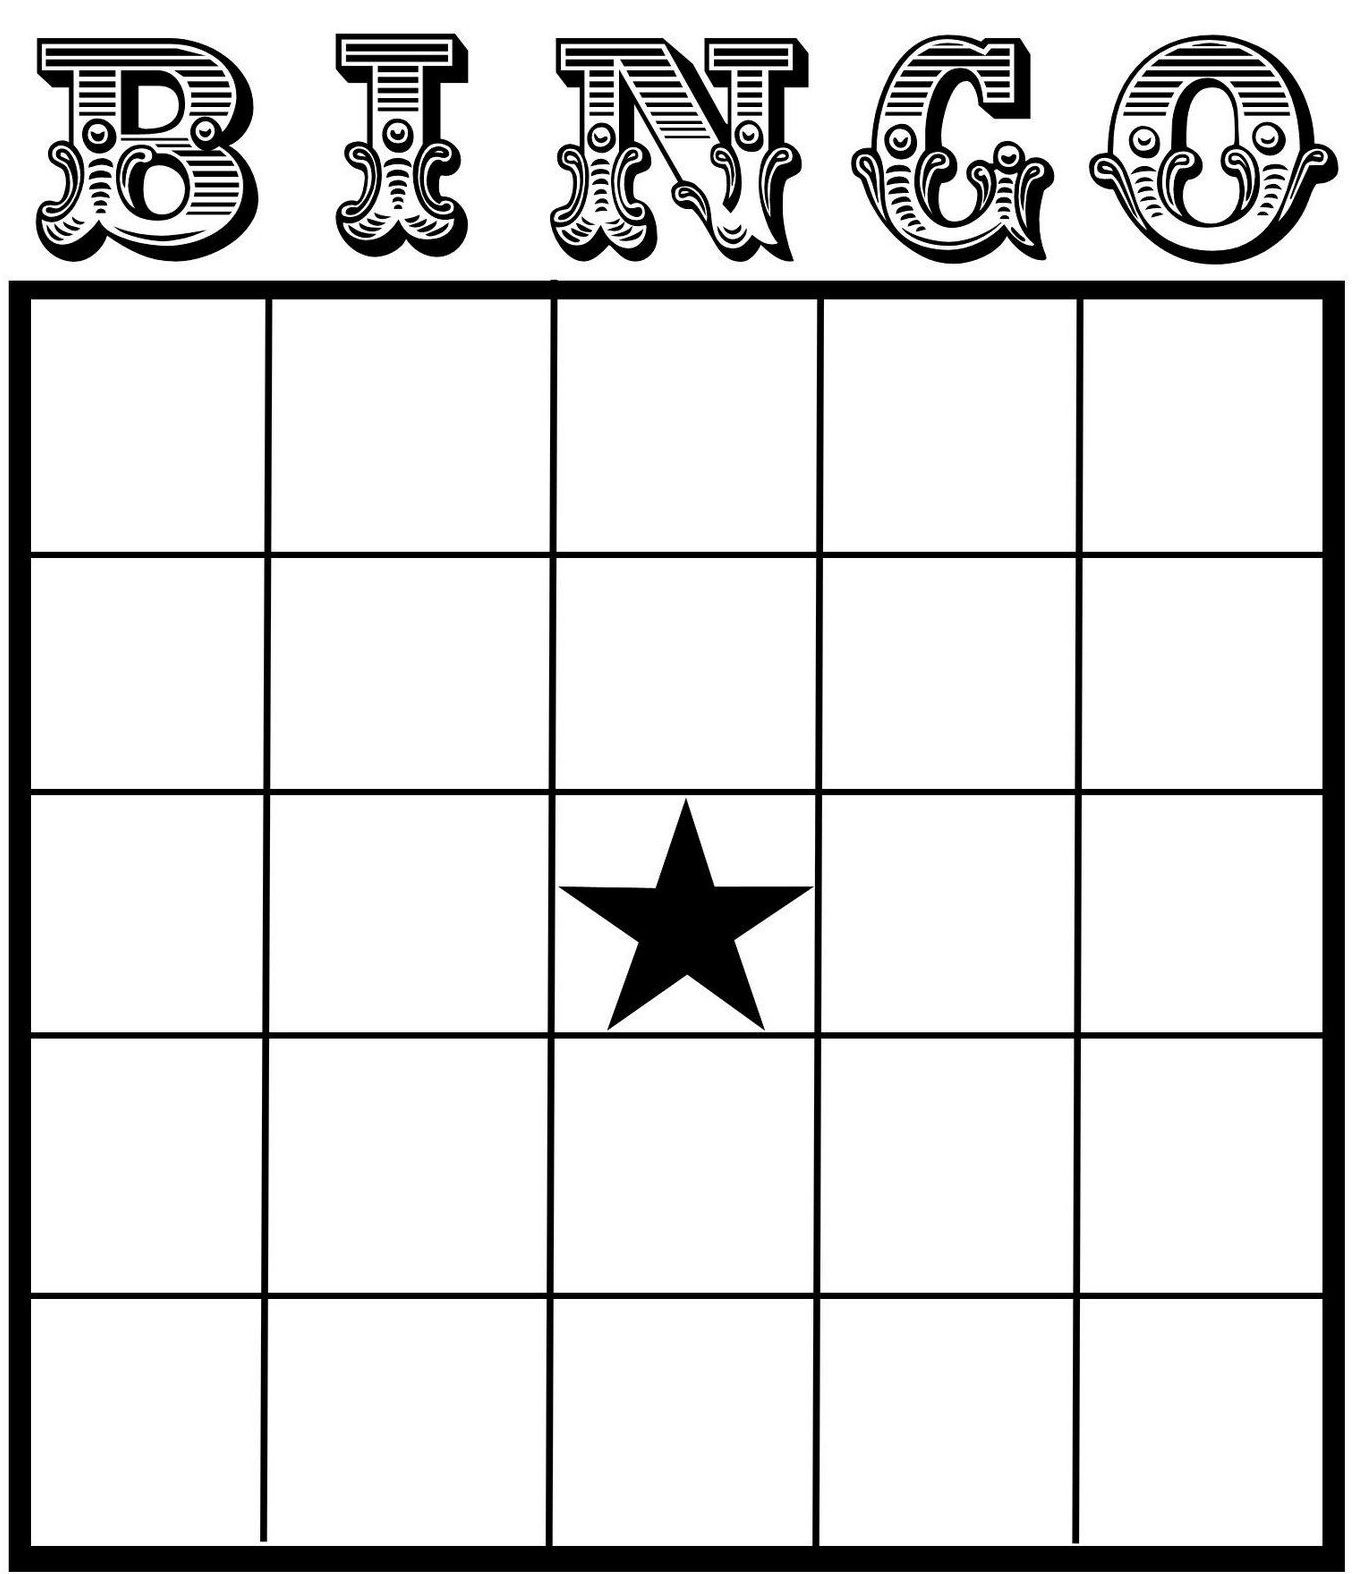 Free Printable Bingo Card Template - Set Your Plan & Tasks With Best - Free Printable Bingo Cards For Large Groups